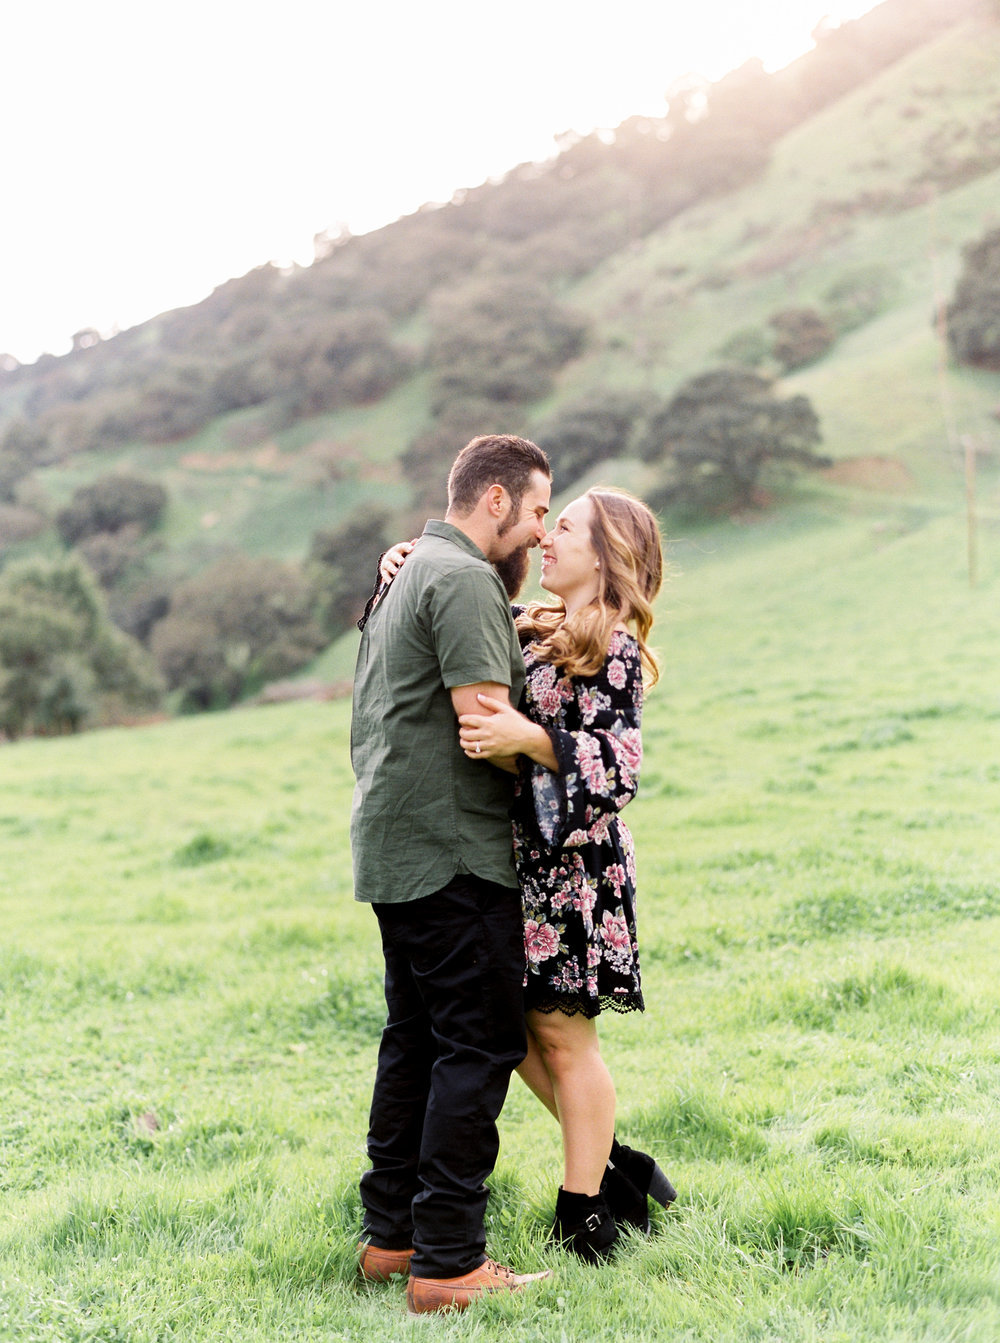 Sunol California Engagement Shoot - Kristine Herman Photography-26.jpg